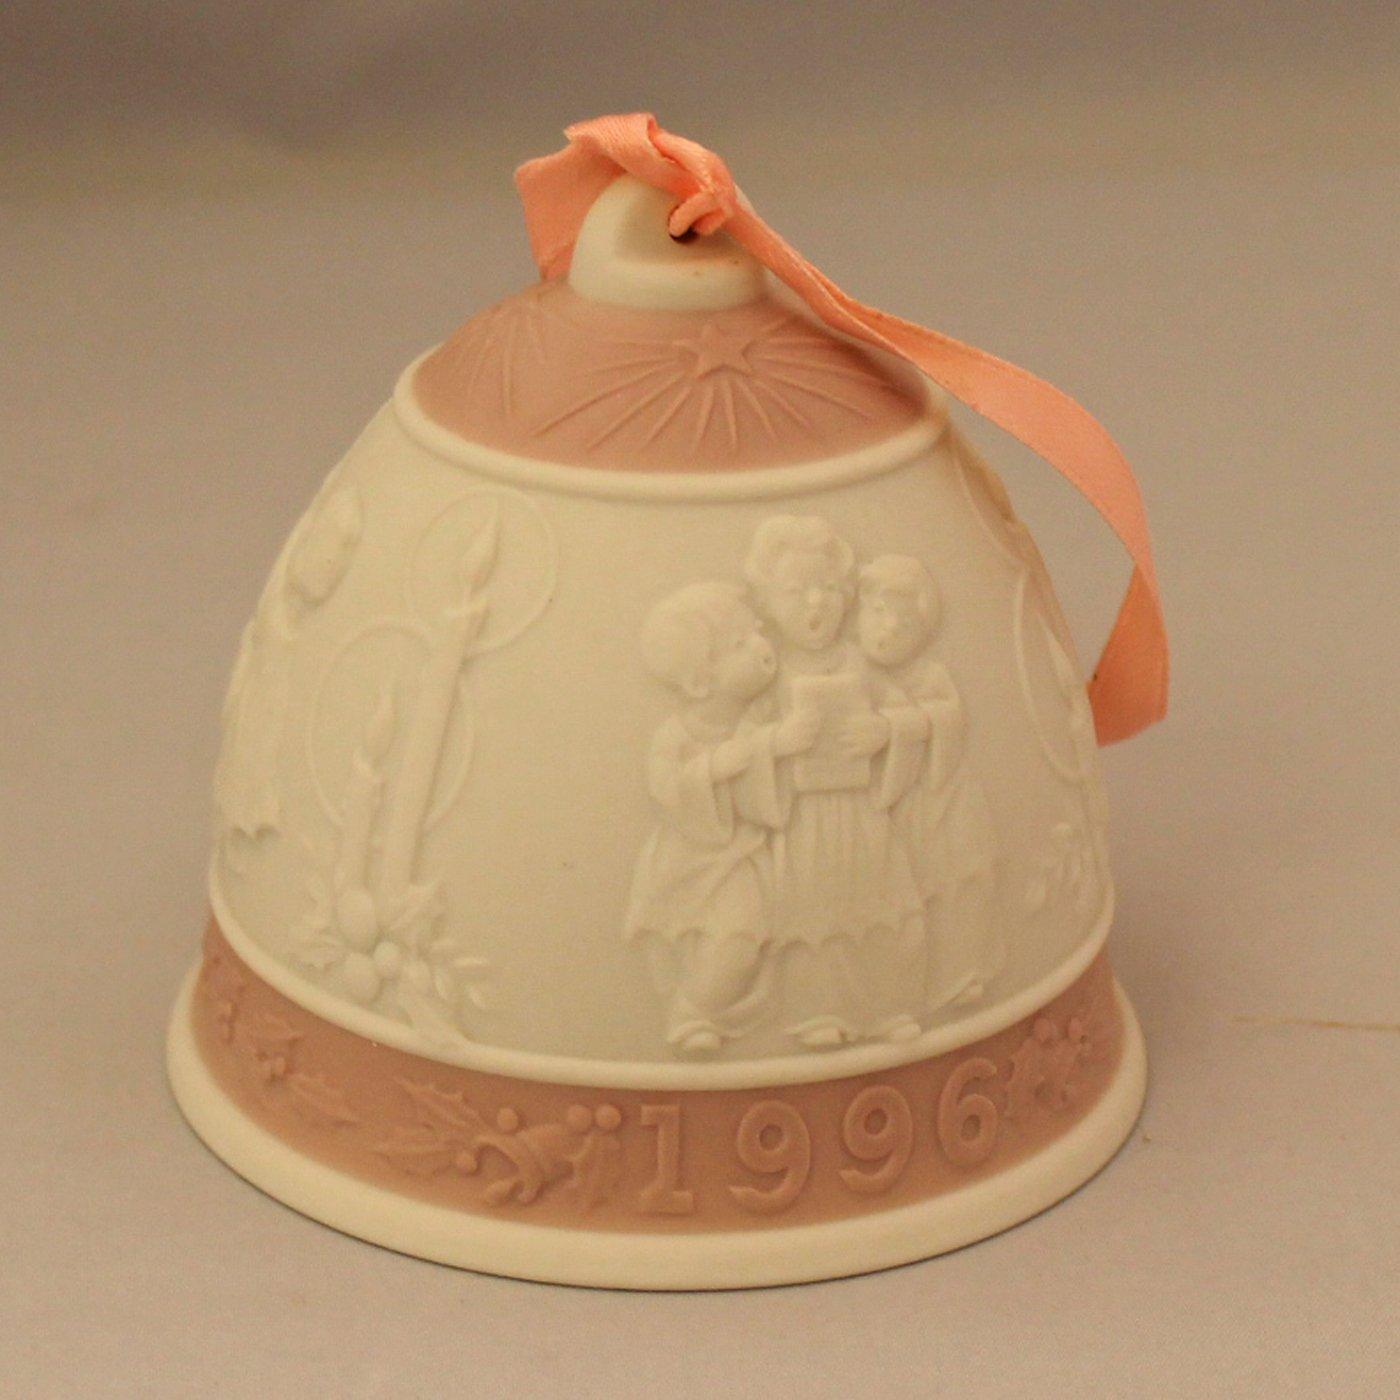 Lladro Christmas Ornament Bell 1996 #16297